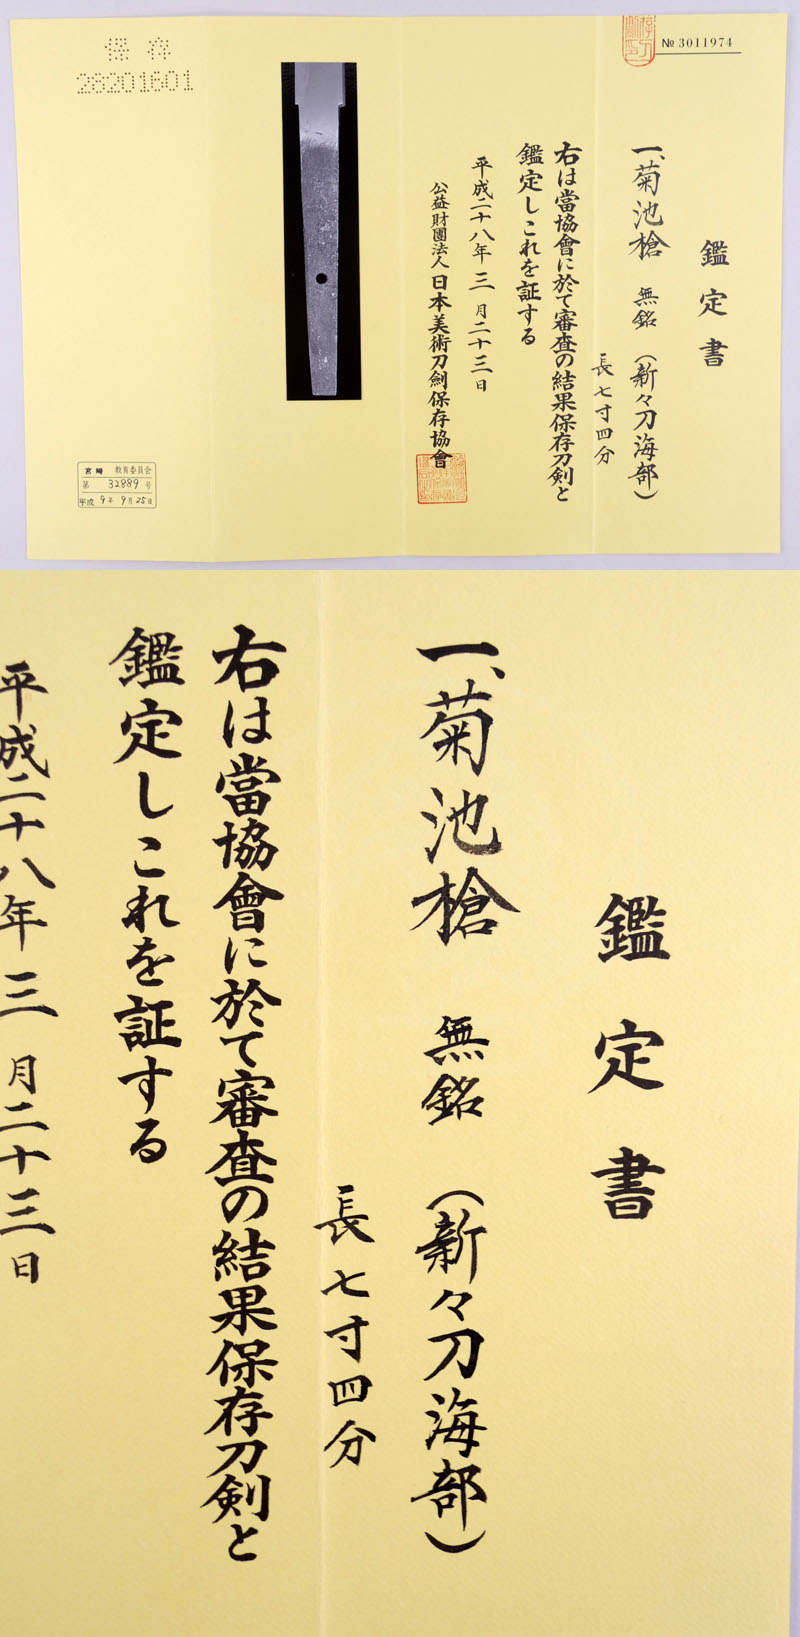 無銘(新々刀海部) Picture of Certificate